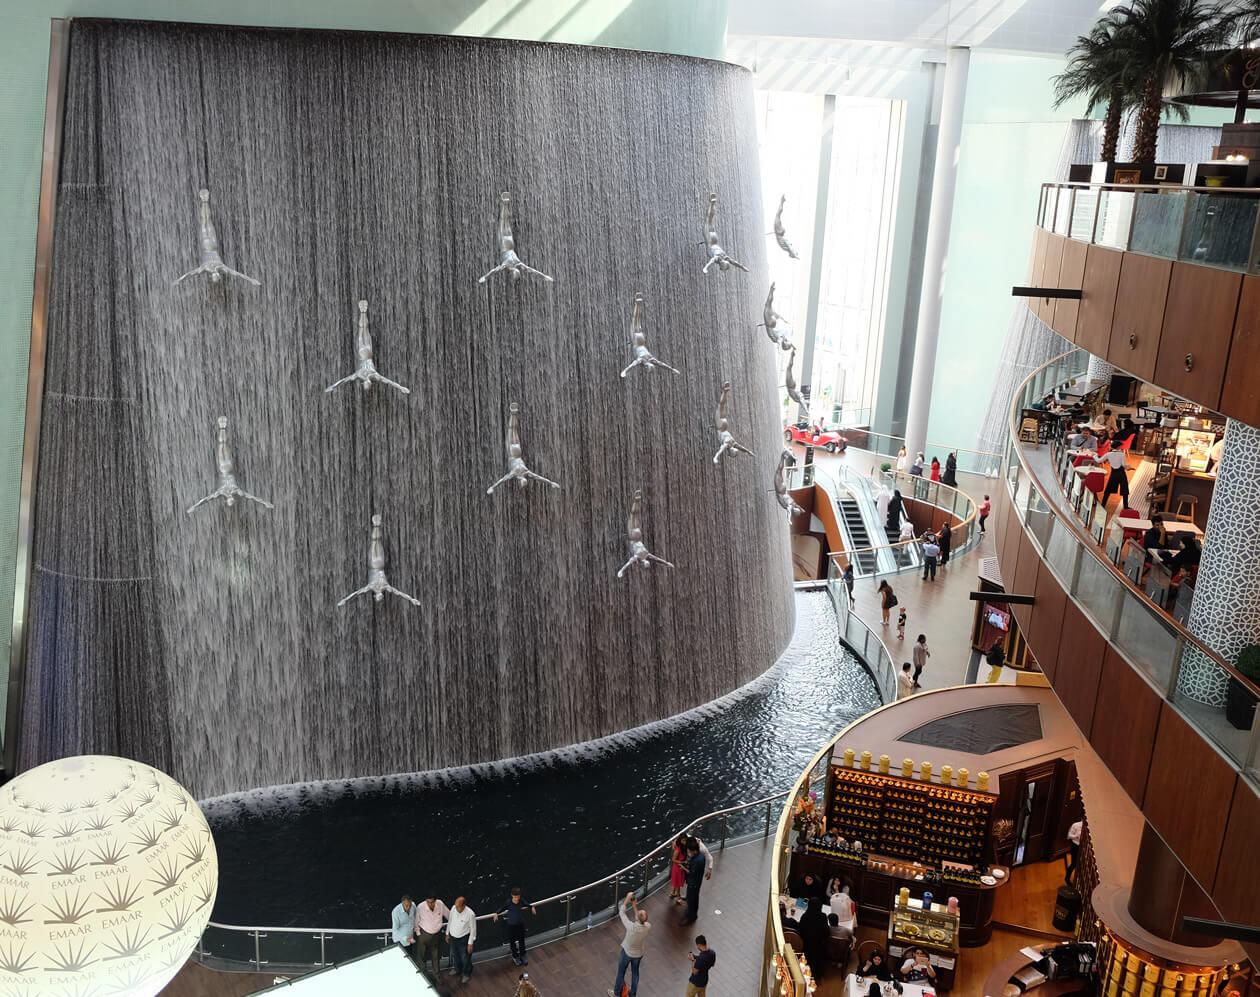 The huge waterfall at Dubai Mall celebrating Dubai's pearl diving history